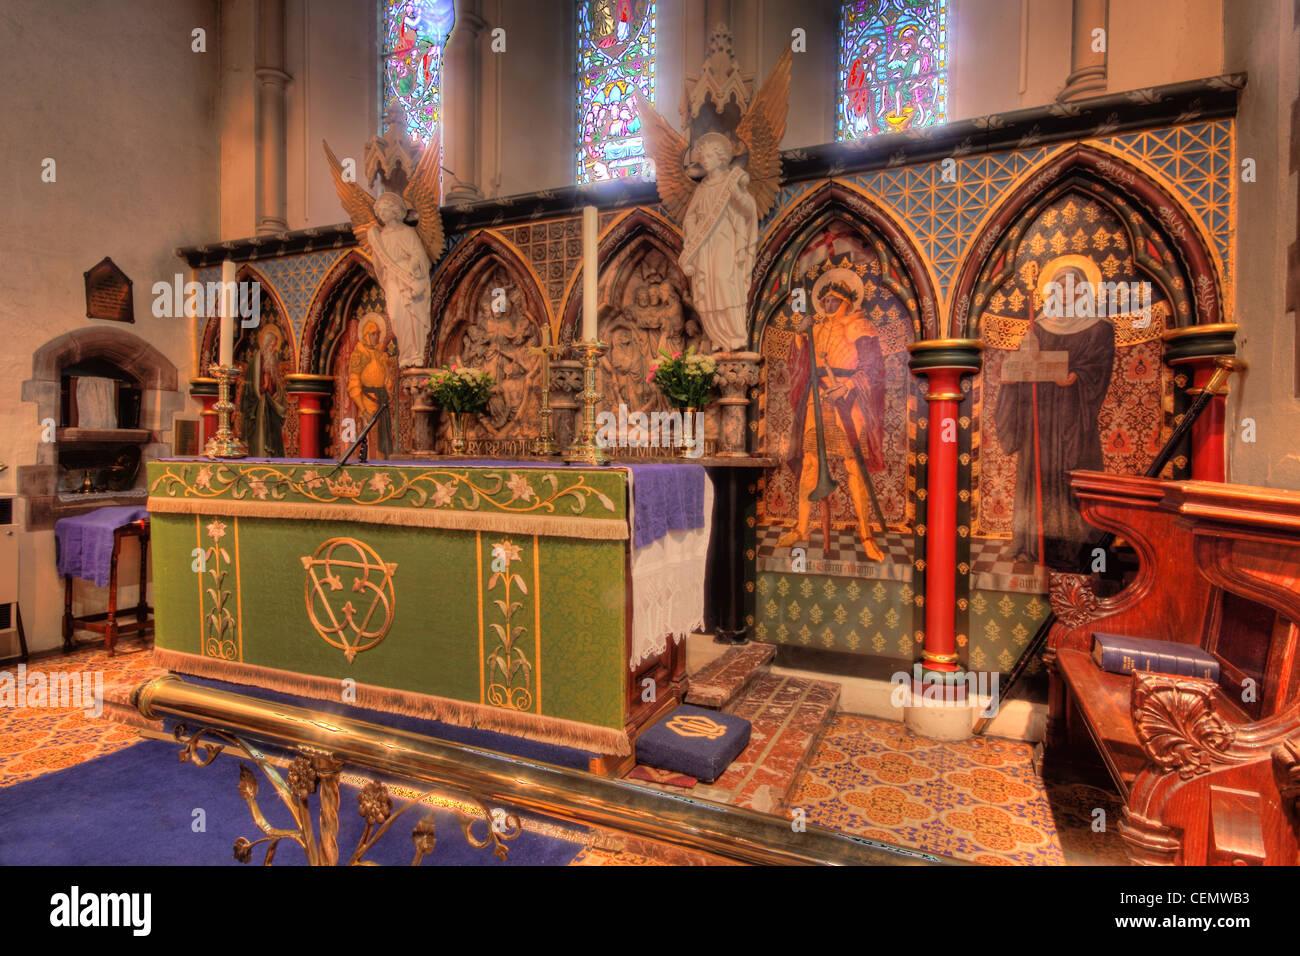 All Saints Church Thelwall, Altar detail South Warrington, Cheshire England UK United Kingdom Stock Photo